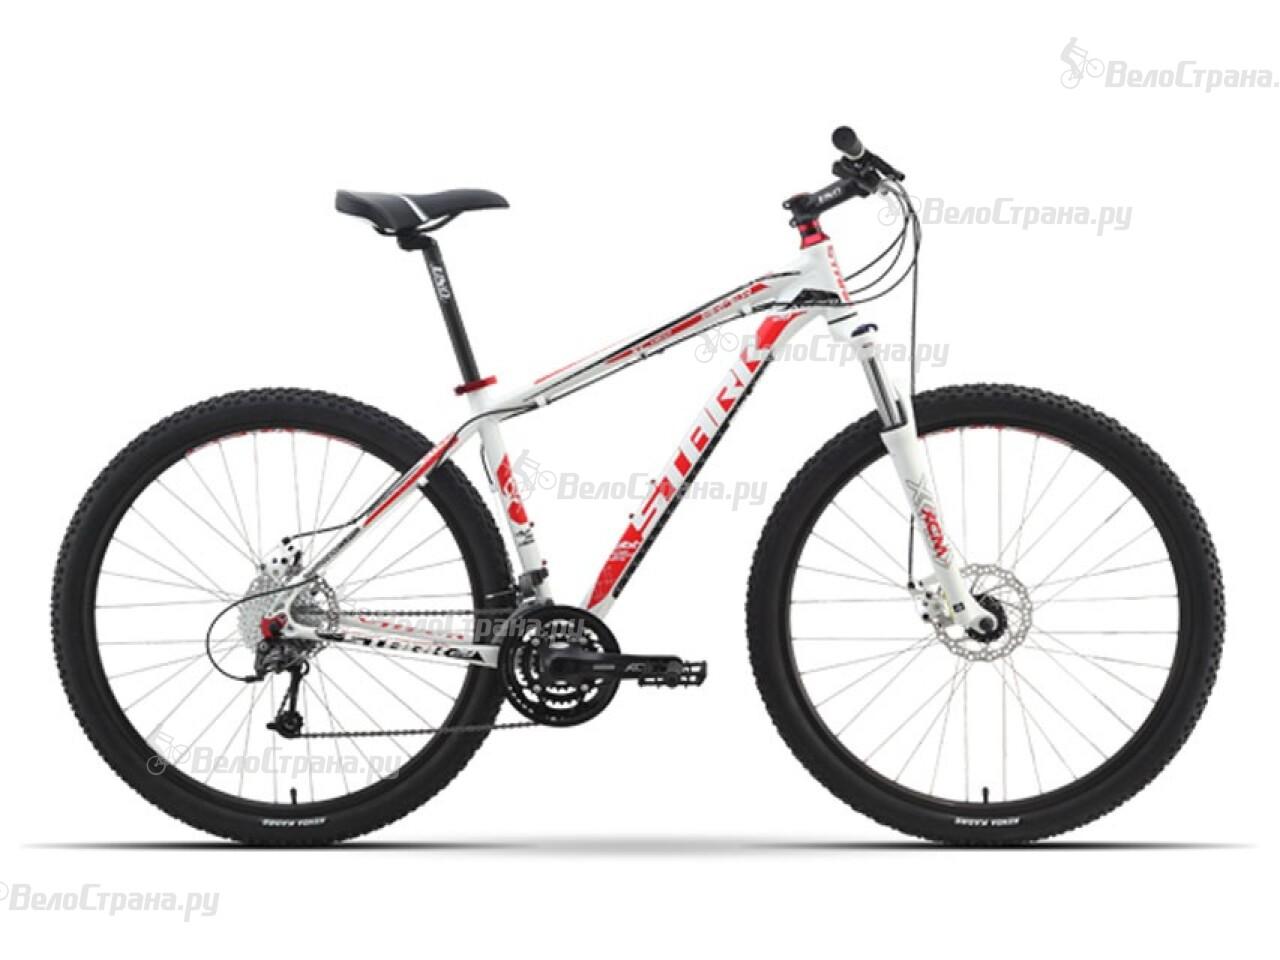 Велосипед Stark Armer 29er Disc (2014) велосипед stark indy disc 26 2016